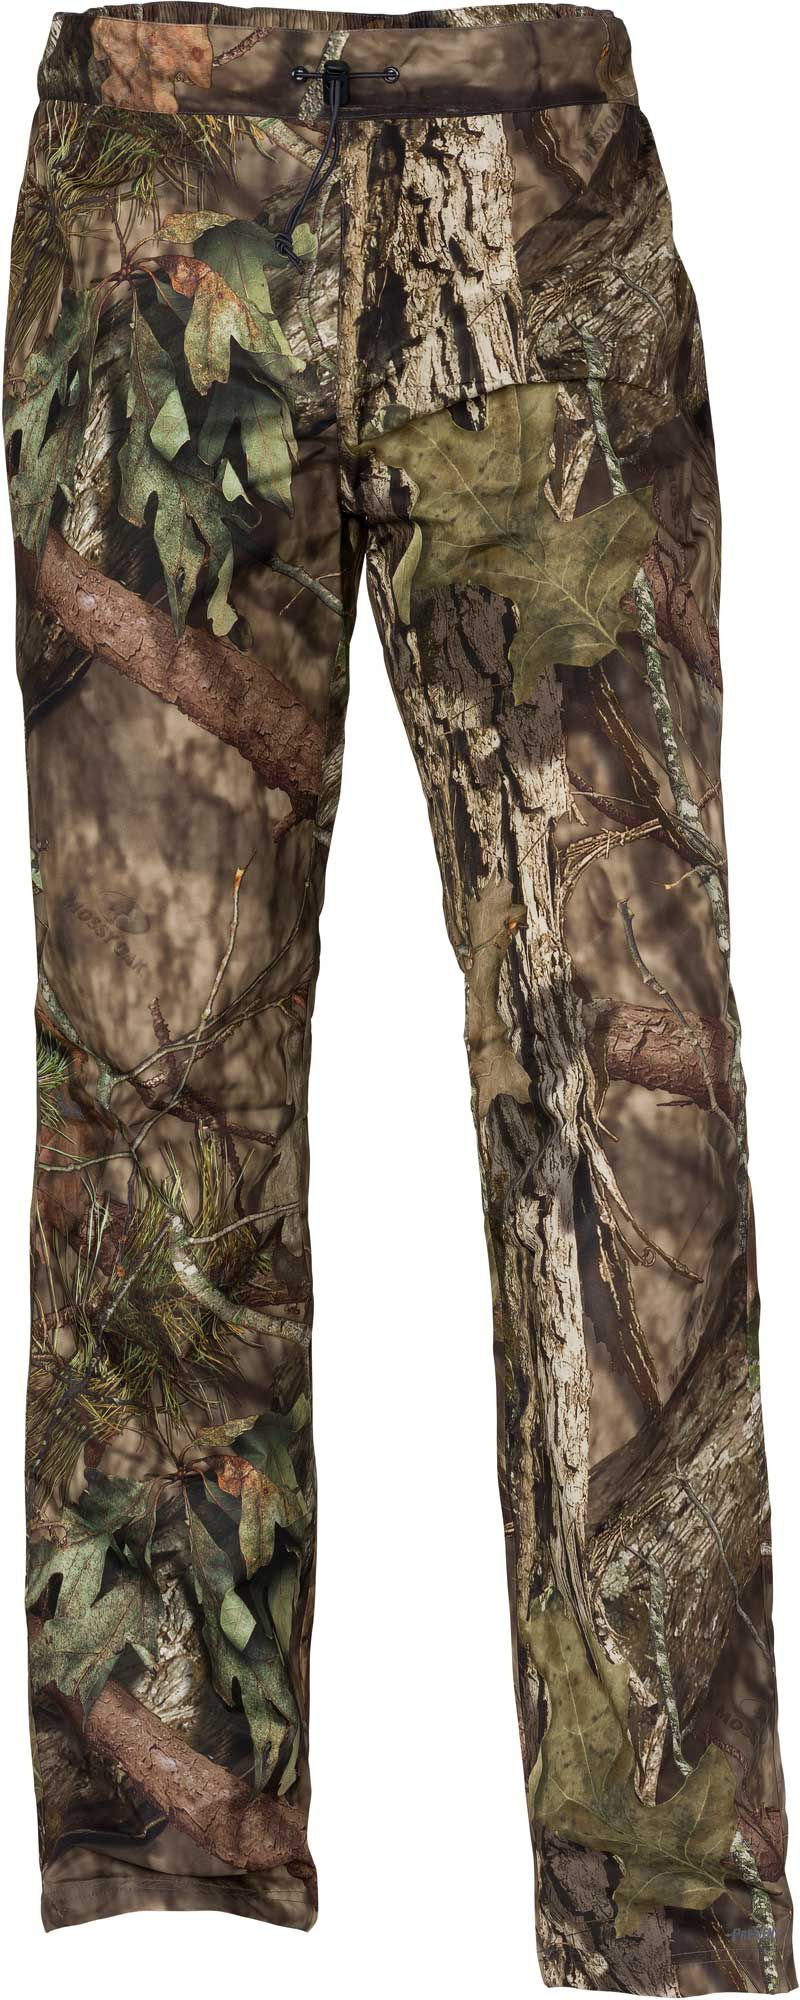 Browning CFS Hunting Rain Pants, Men's, Medium, Mossy Oak Breakup Country thumbnail